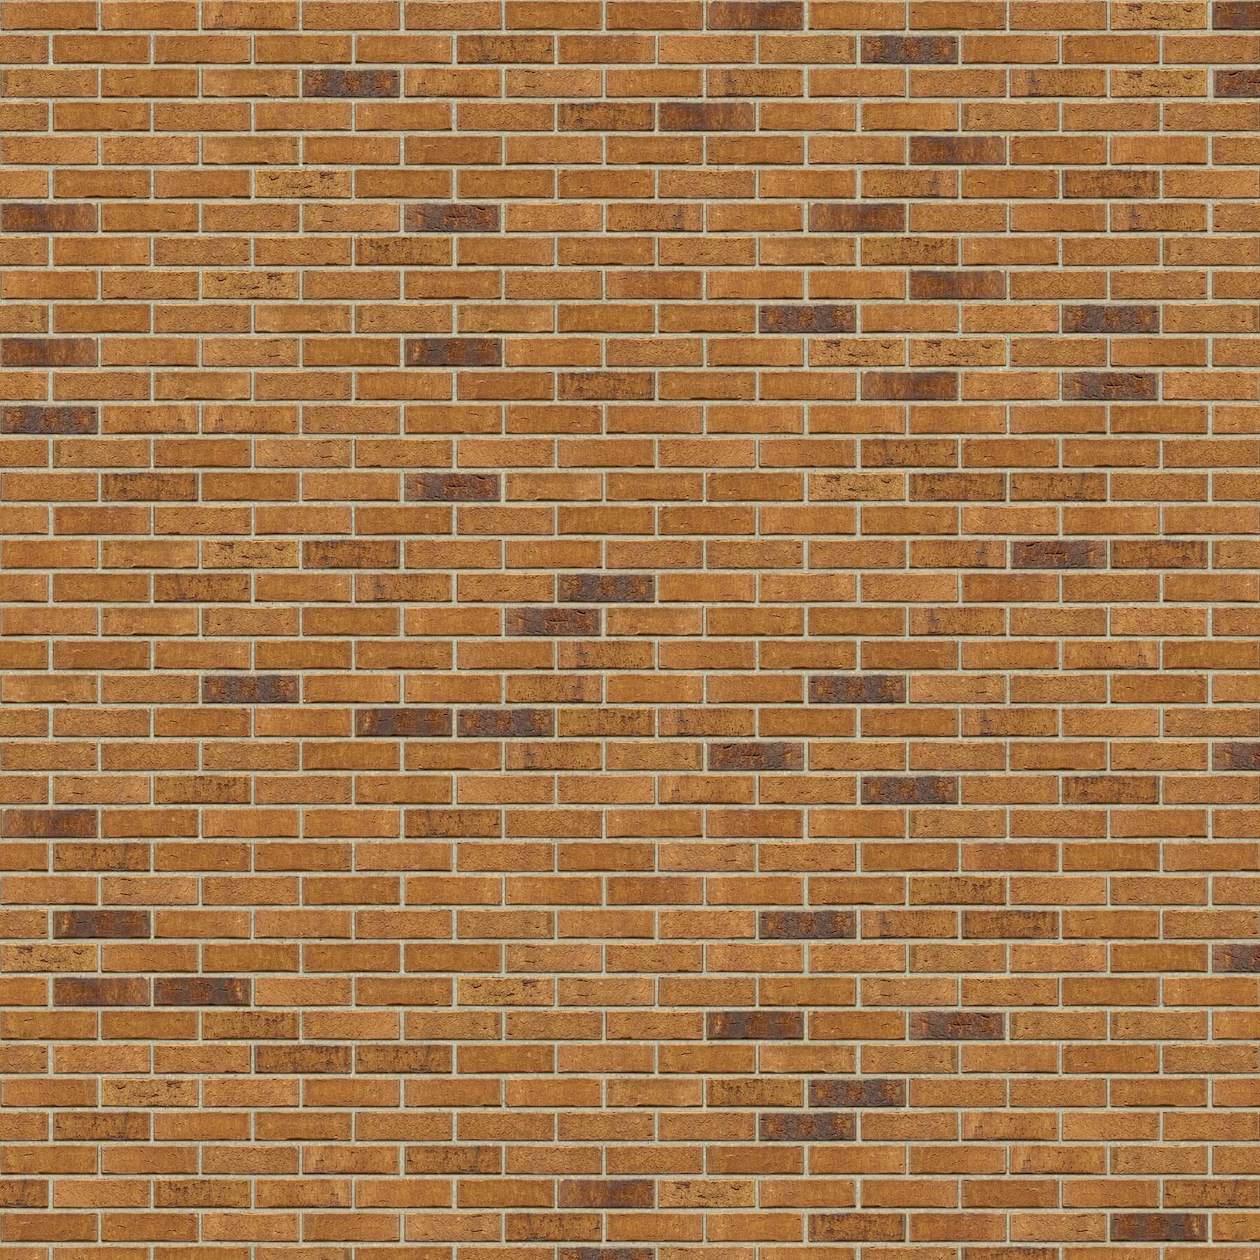 Puna-cigla-FeldHaus-Klinker-brick-house-nf-k-684-Bez Fuga